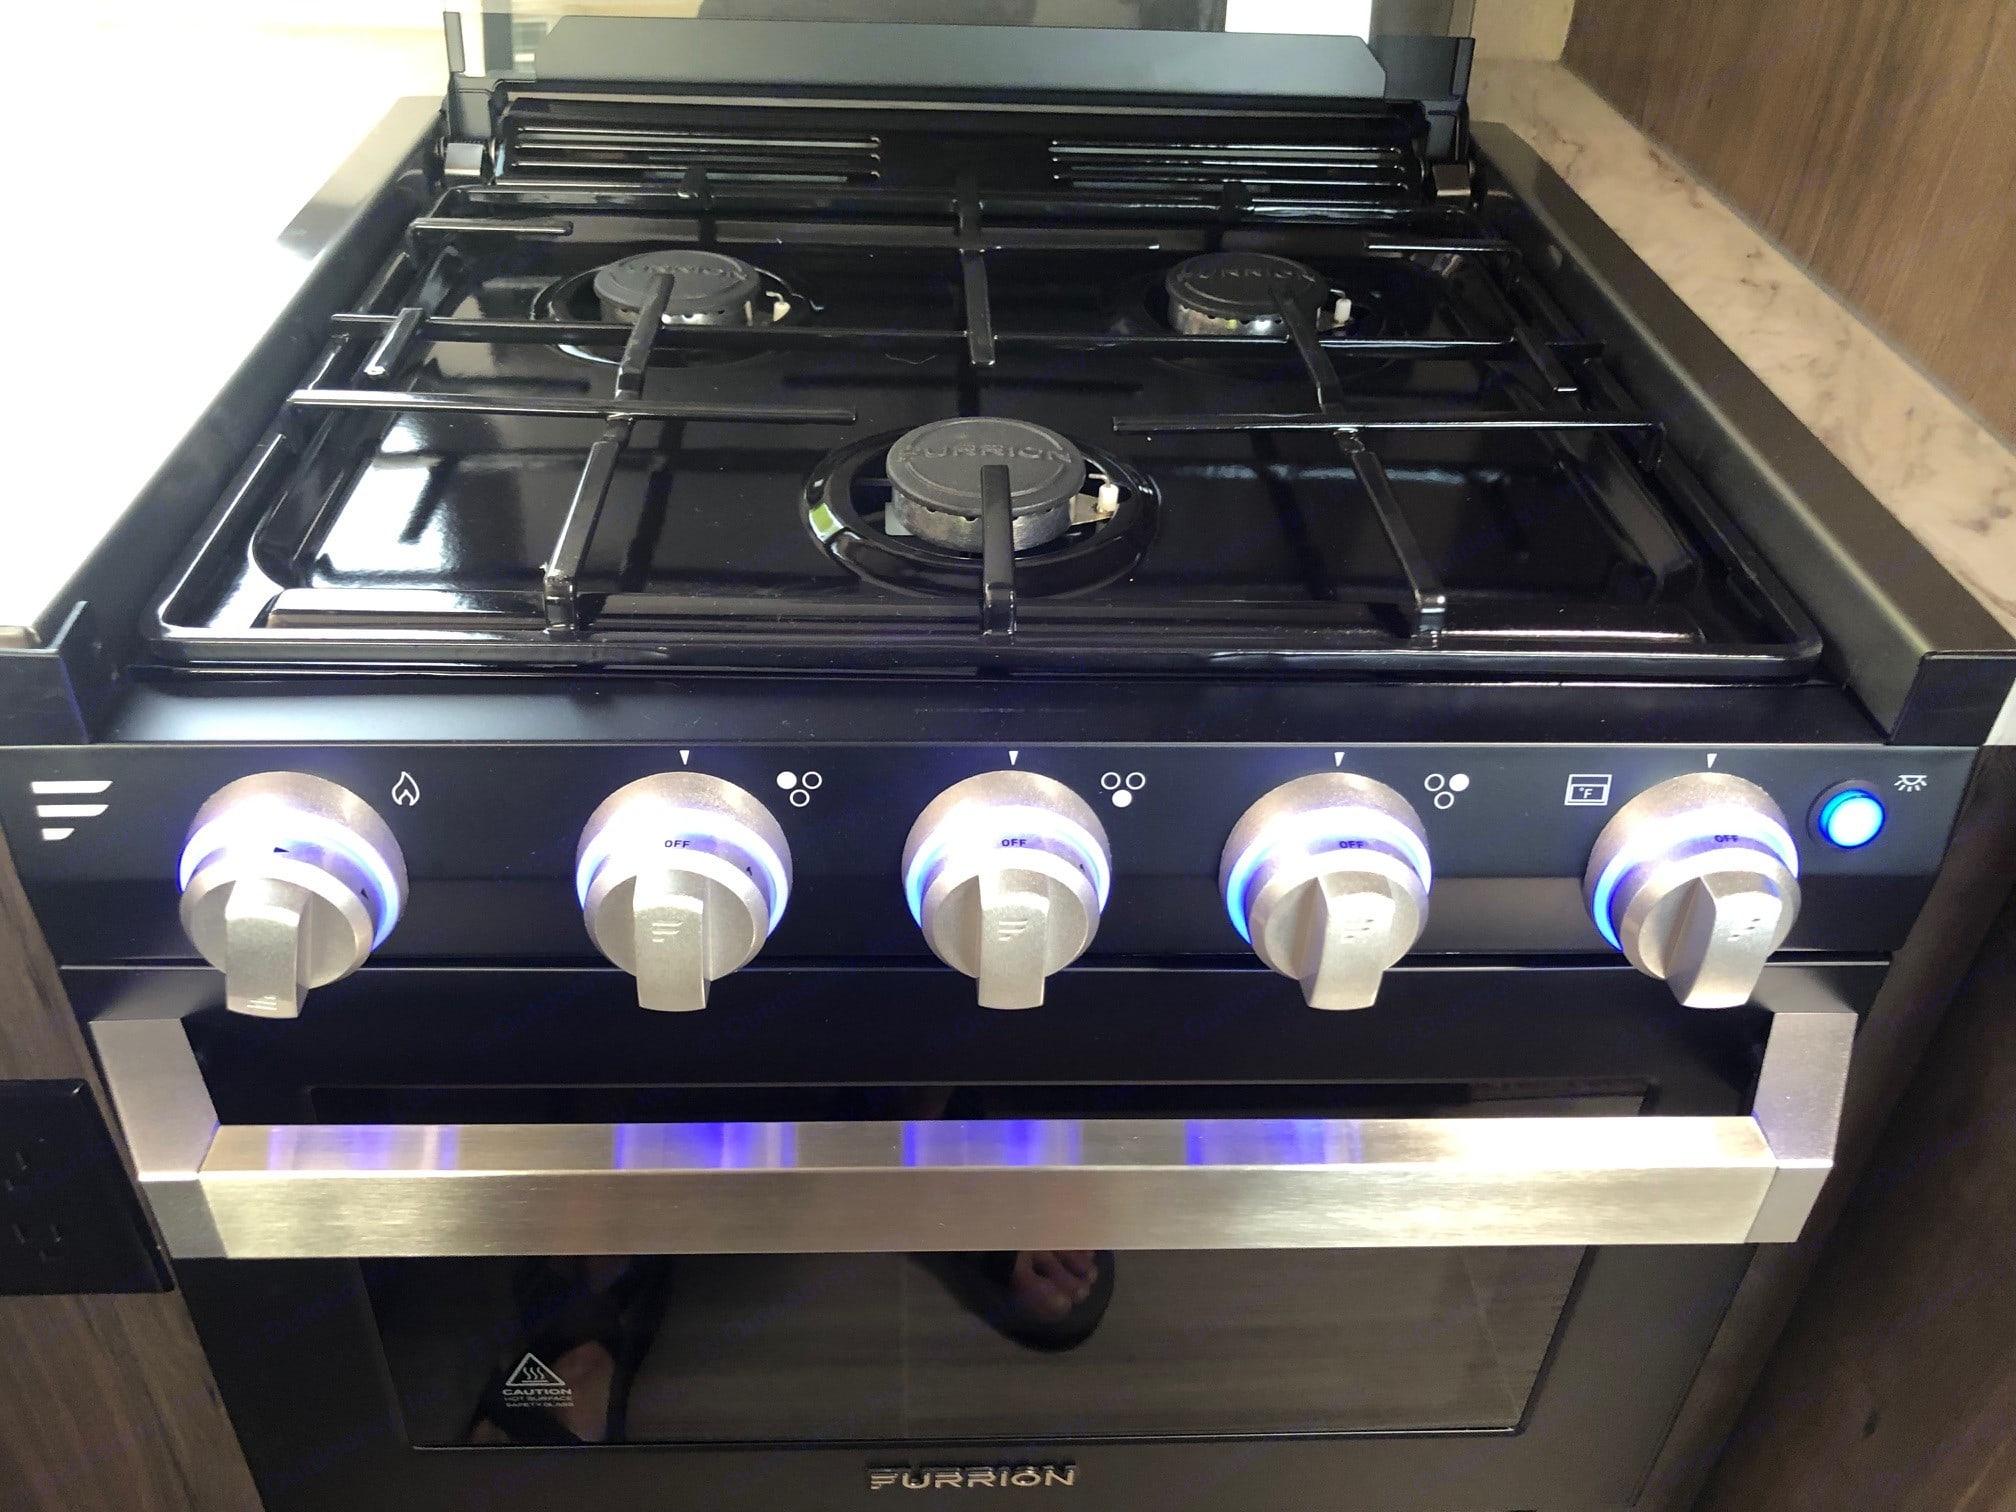 3 burner stove with fun LED lighting. Keystone Passport 2019